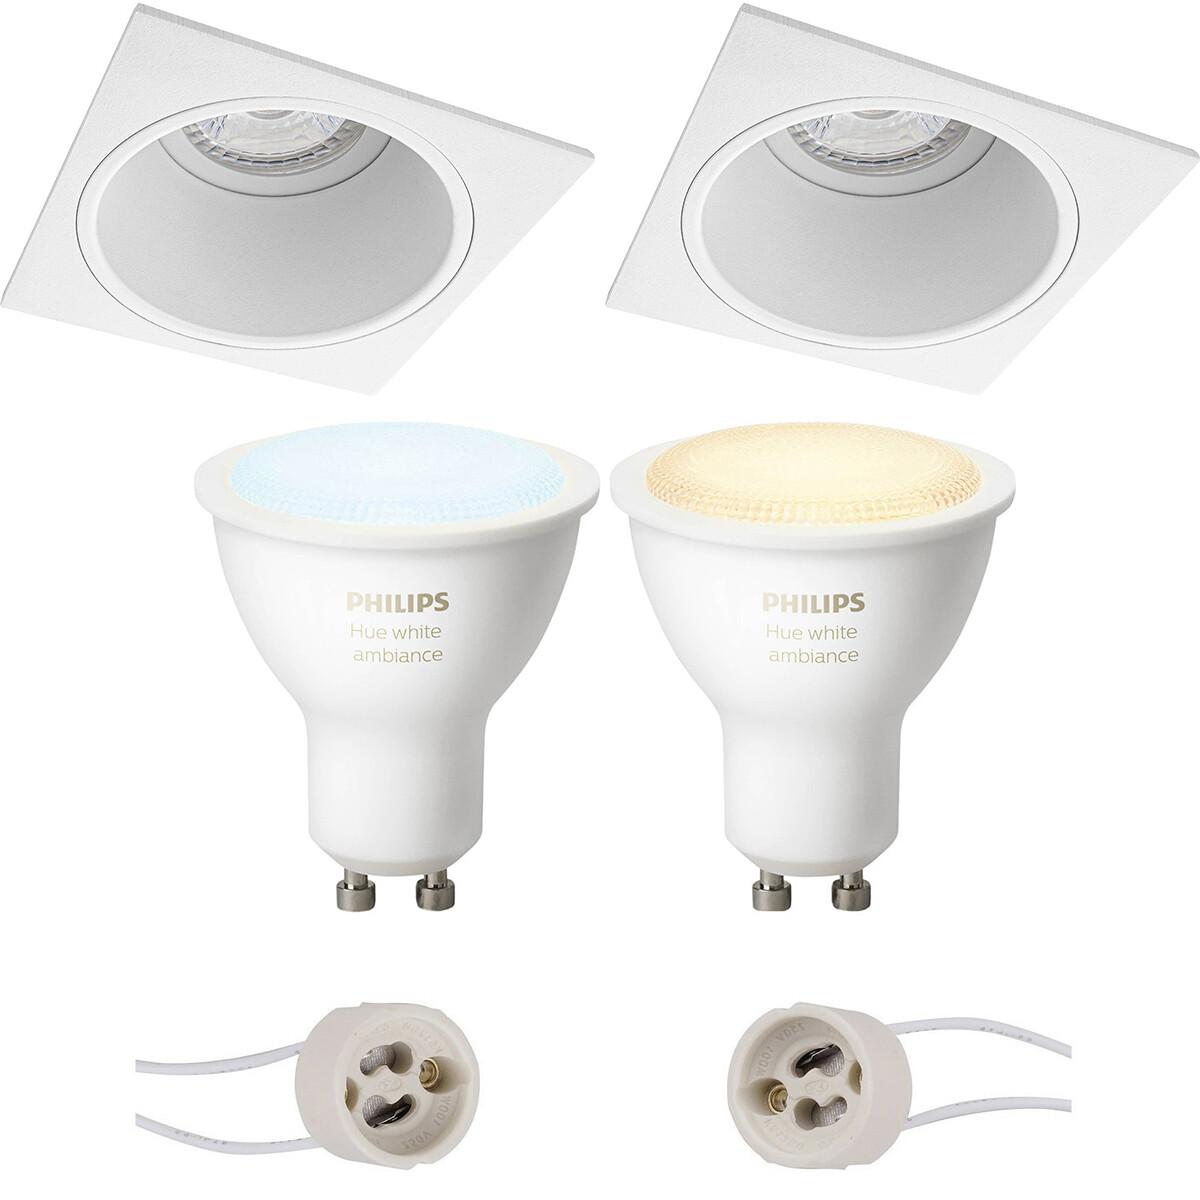 Pragmi Minko Pro - Inbouw Vierkant - Mat Wit - Verdiept - 90mm - Philips Hue - LED Spot Set GU10 - W